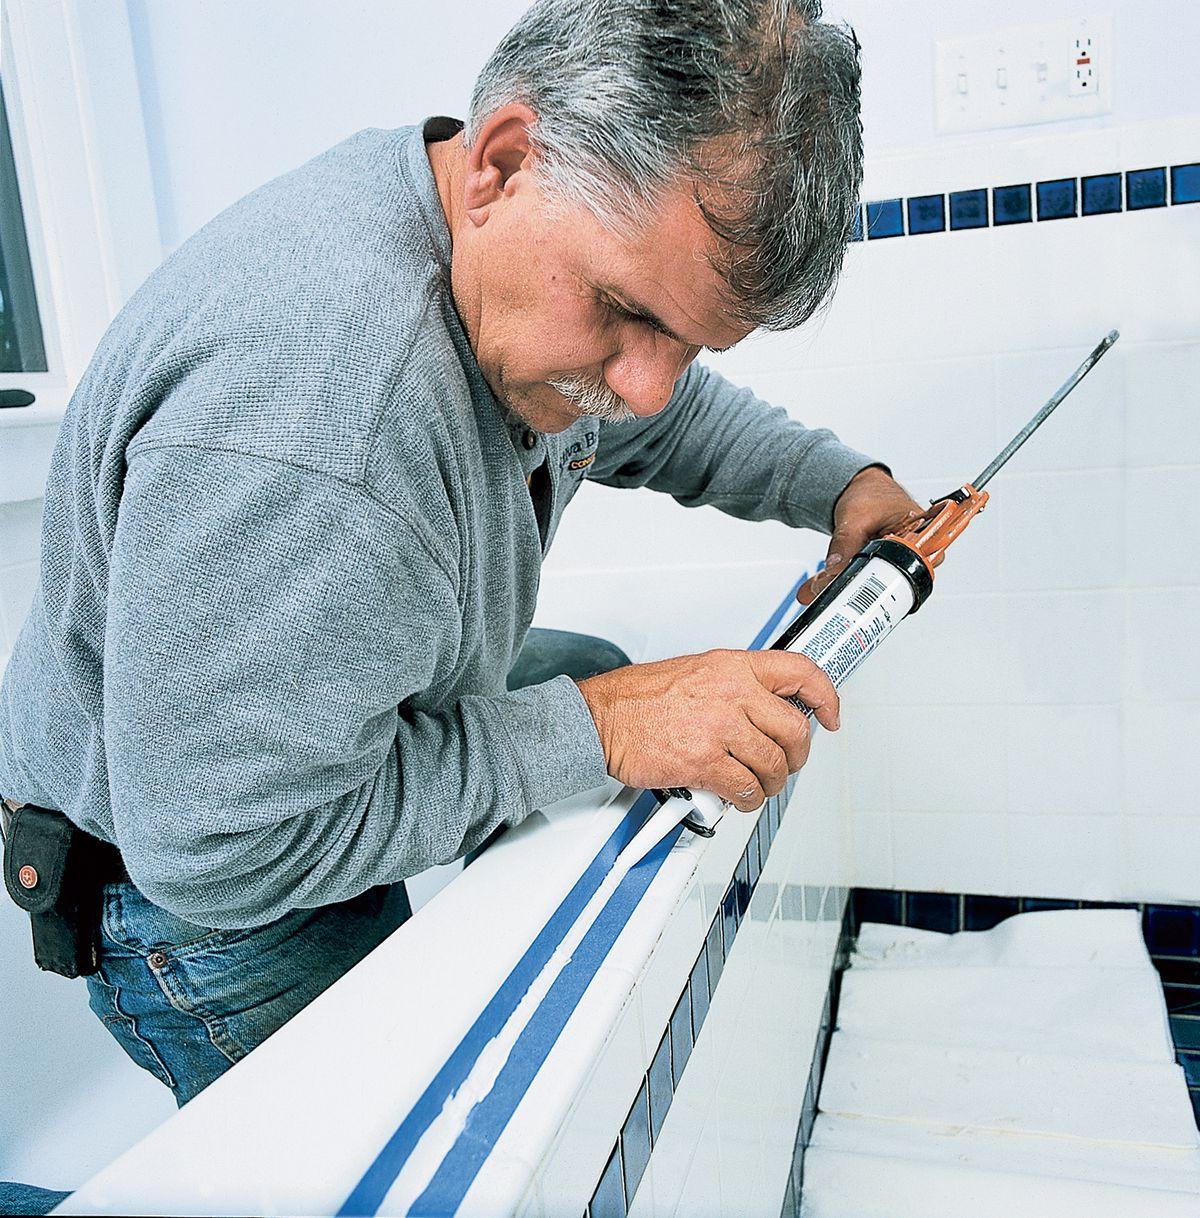 Man Caulking Bathroom